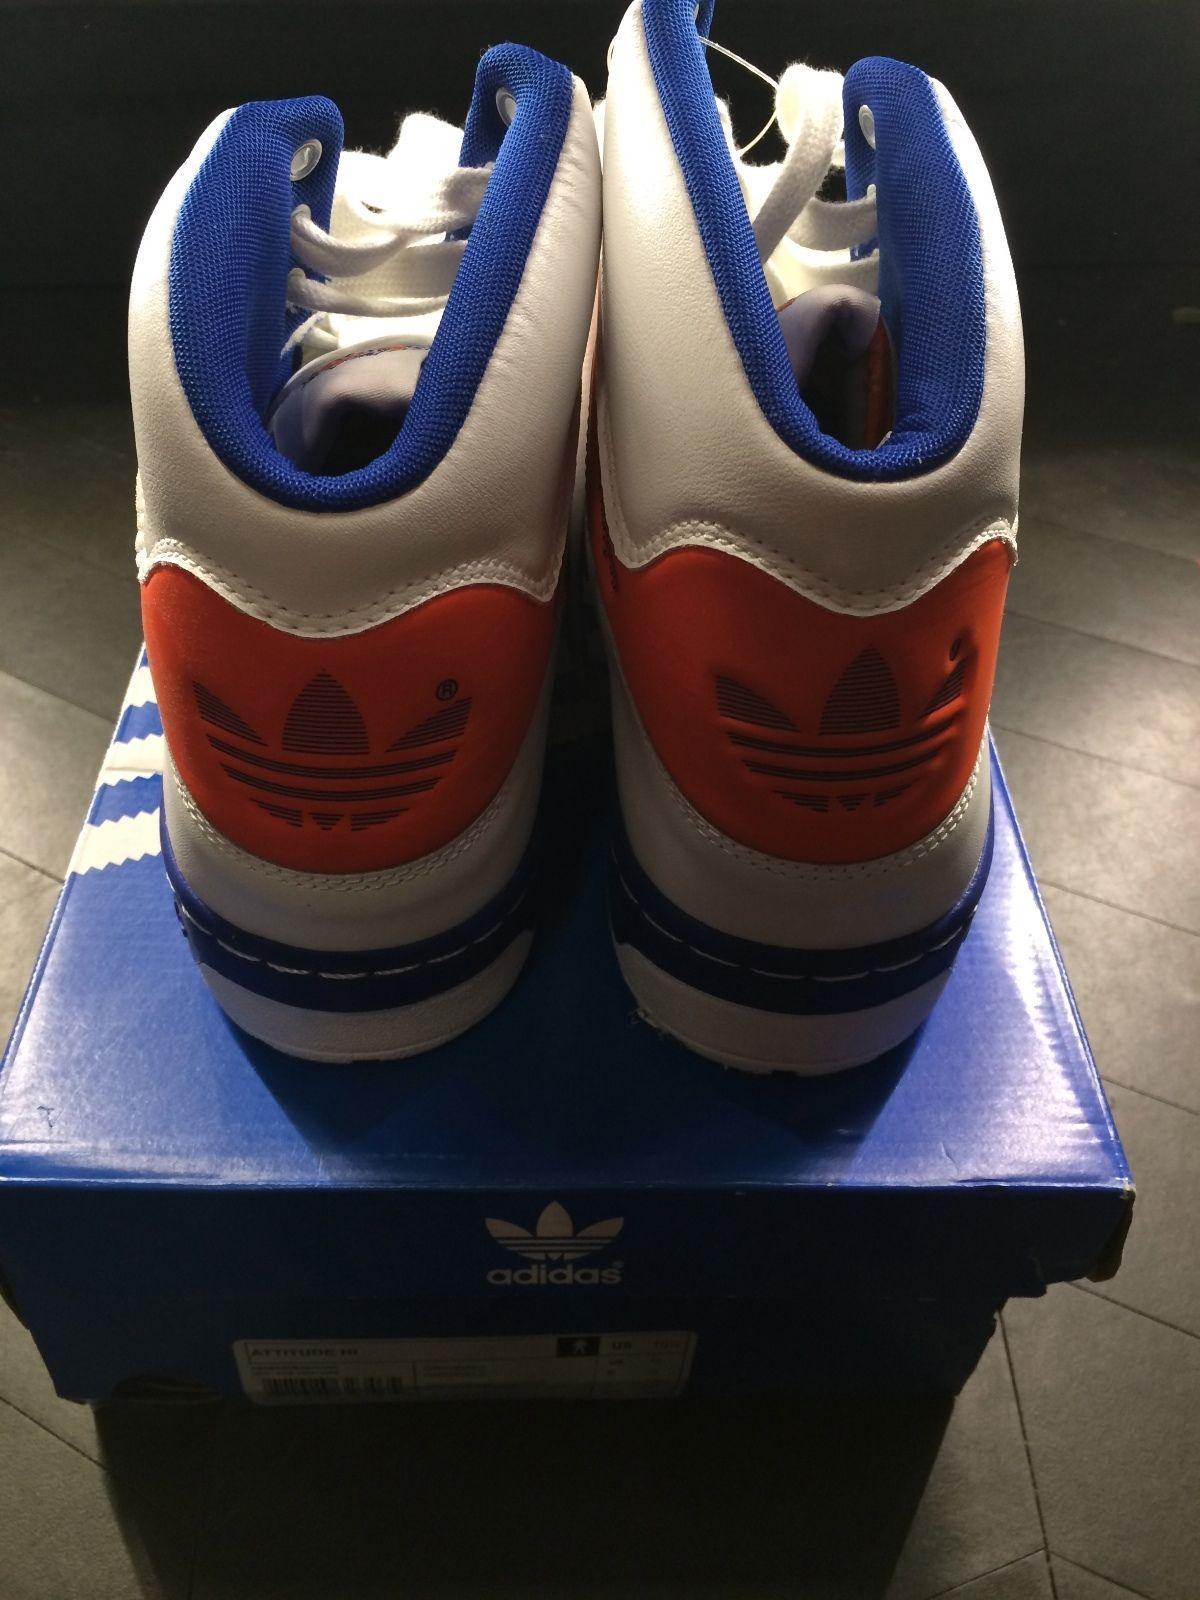 Adidas Originals Attitude Hi Patrick Ewing New York Knicks